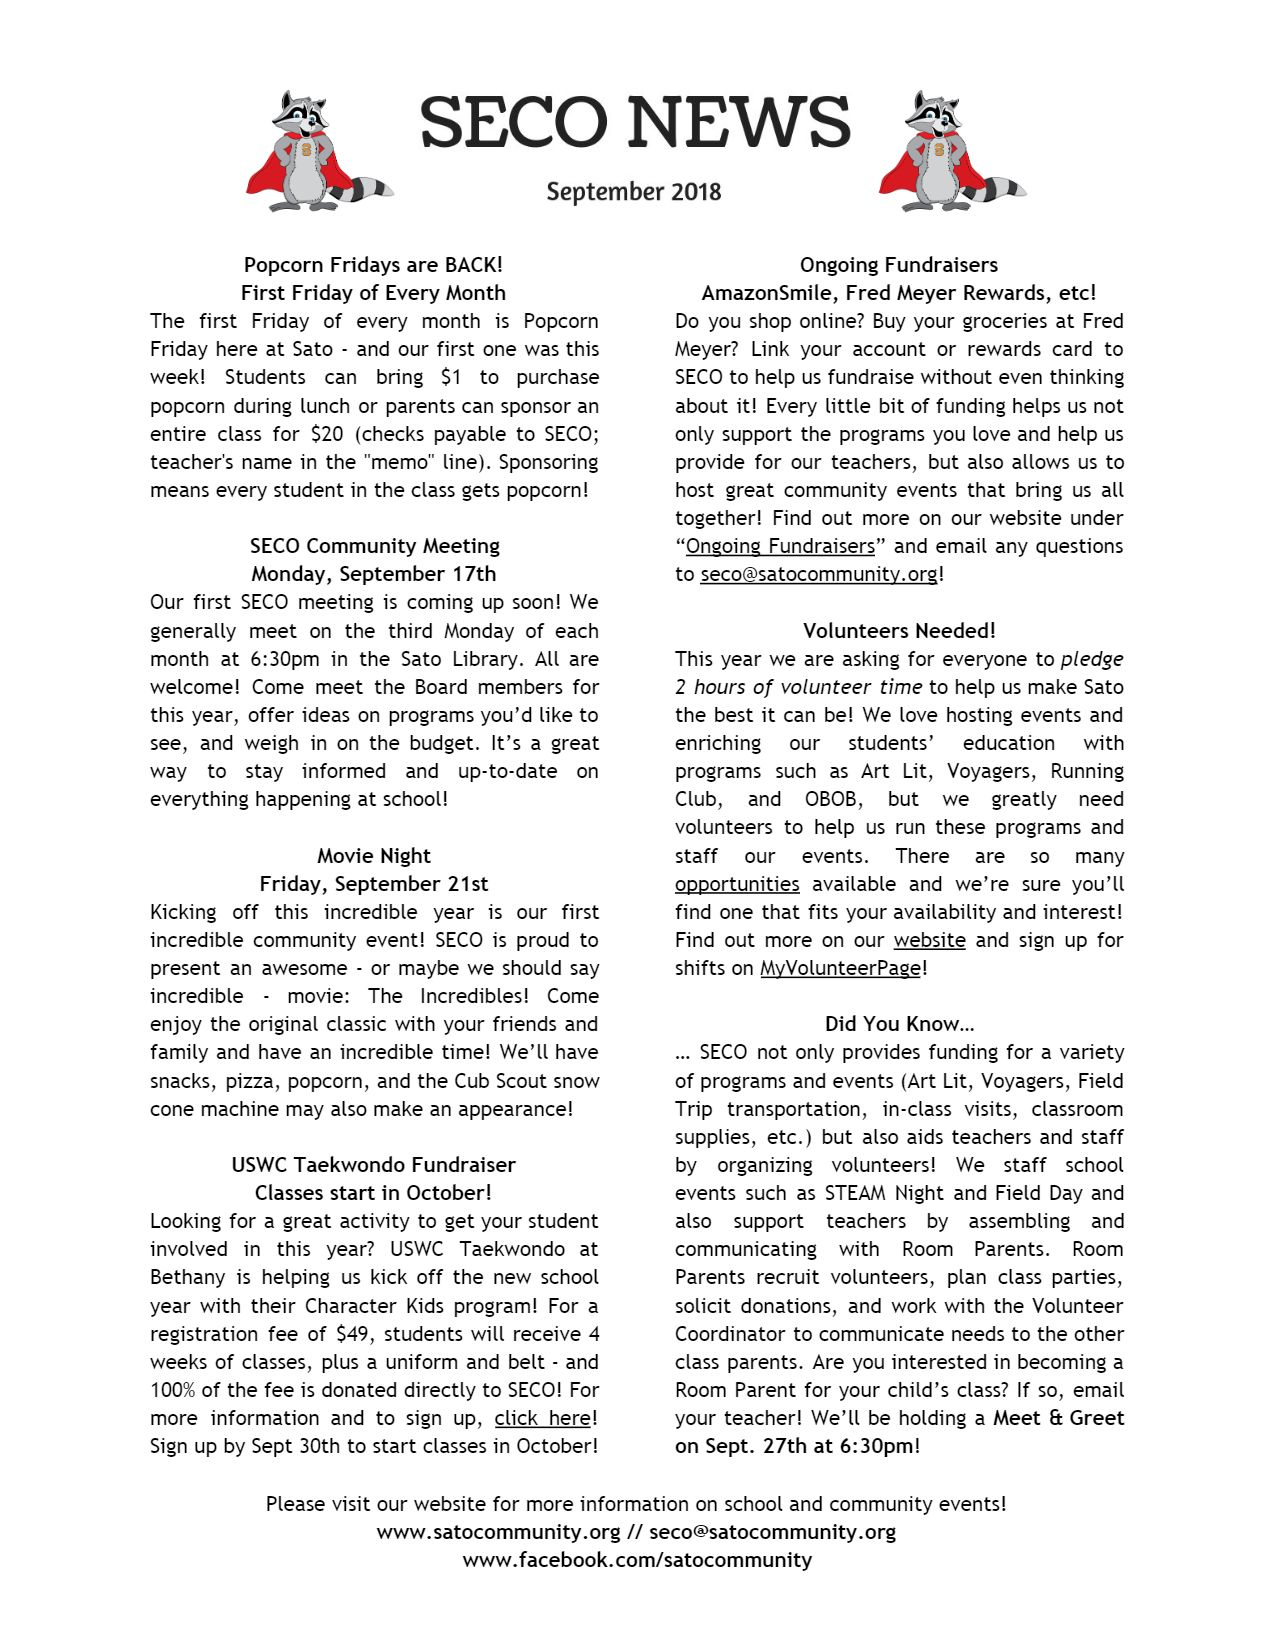 SECONewsSept2018-1.jpg